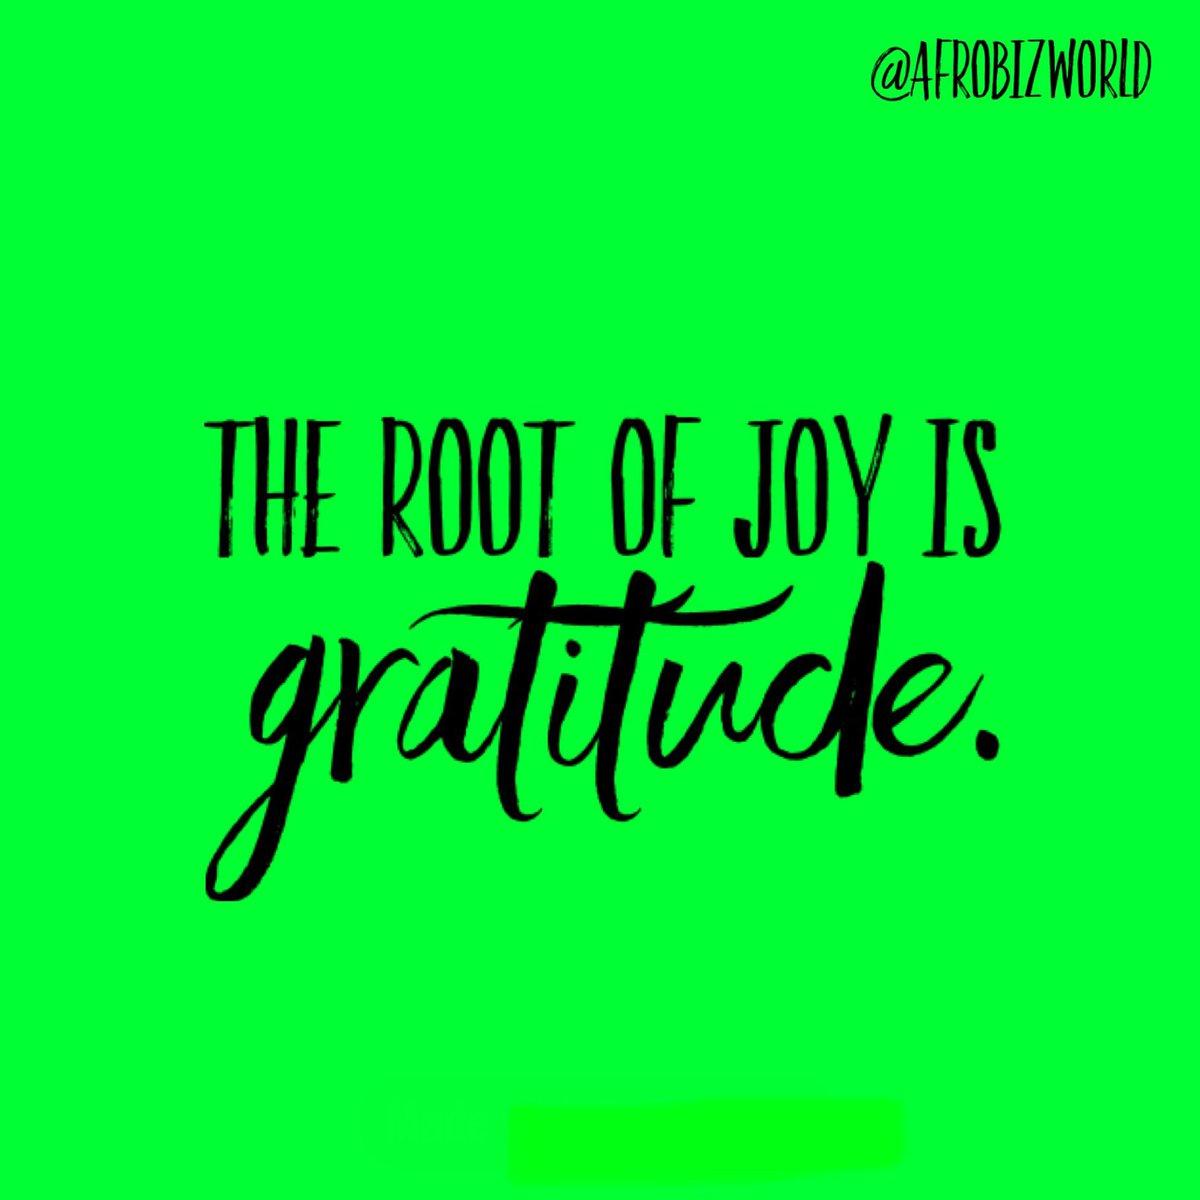 The root of joy is gratitude. And how sweet it is! 🍀 . . #Joy #Gratitude #PracticeDaily #AfroBizWorld #AfroBiz #Afro #AfroWorld #Happiness #Roots #Sweet #BlackOwned #BlackOwnedBusiness